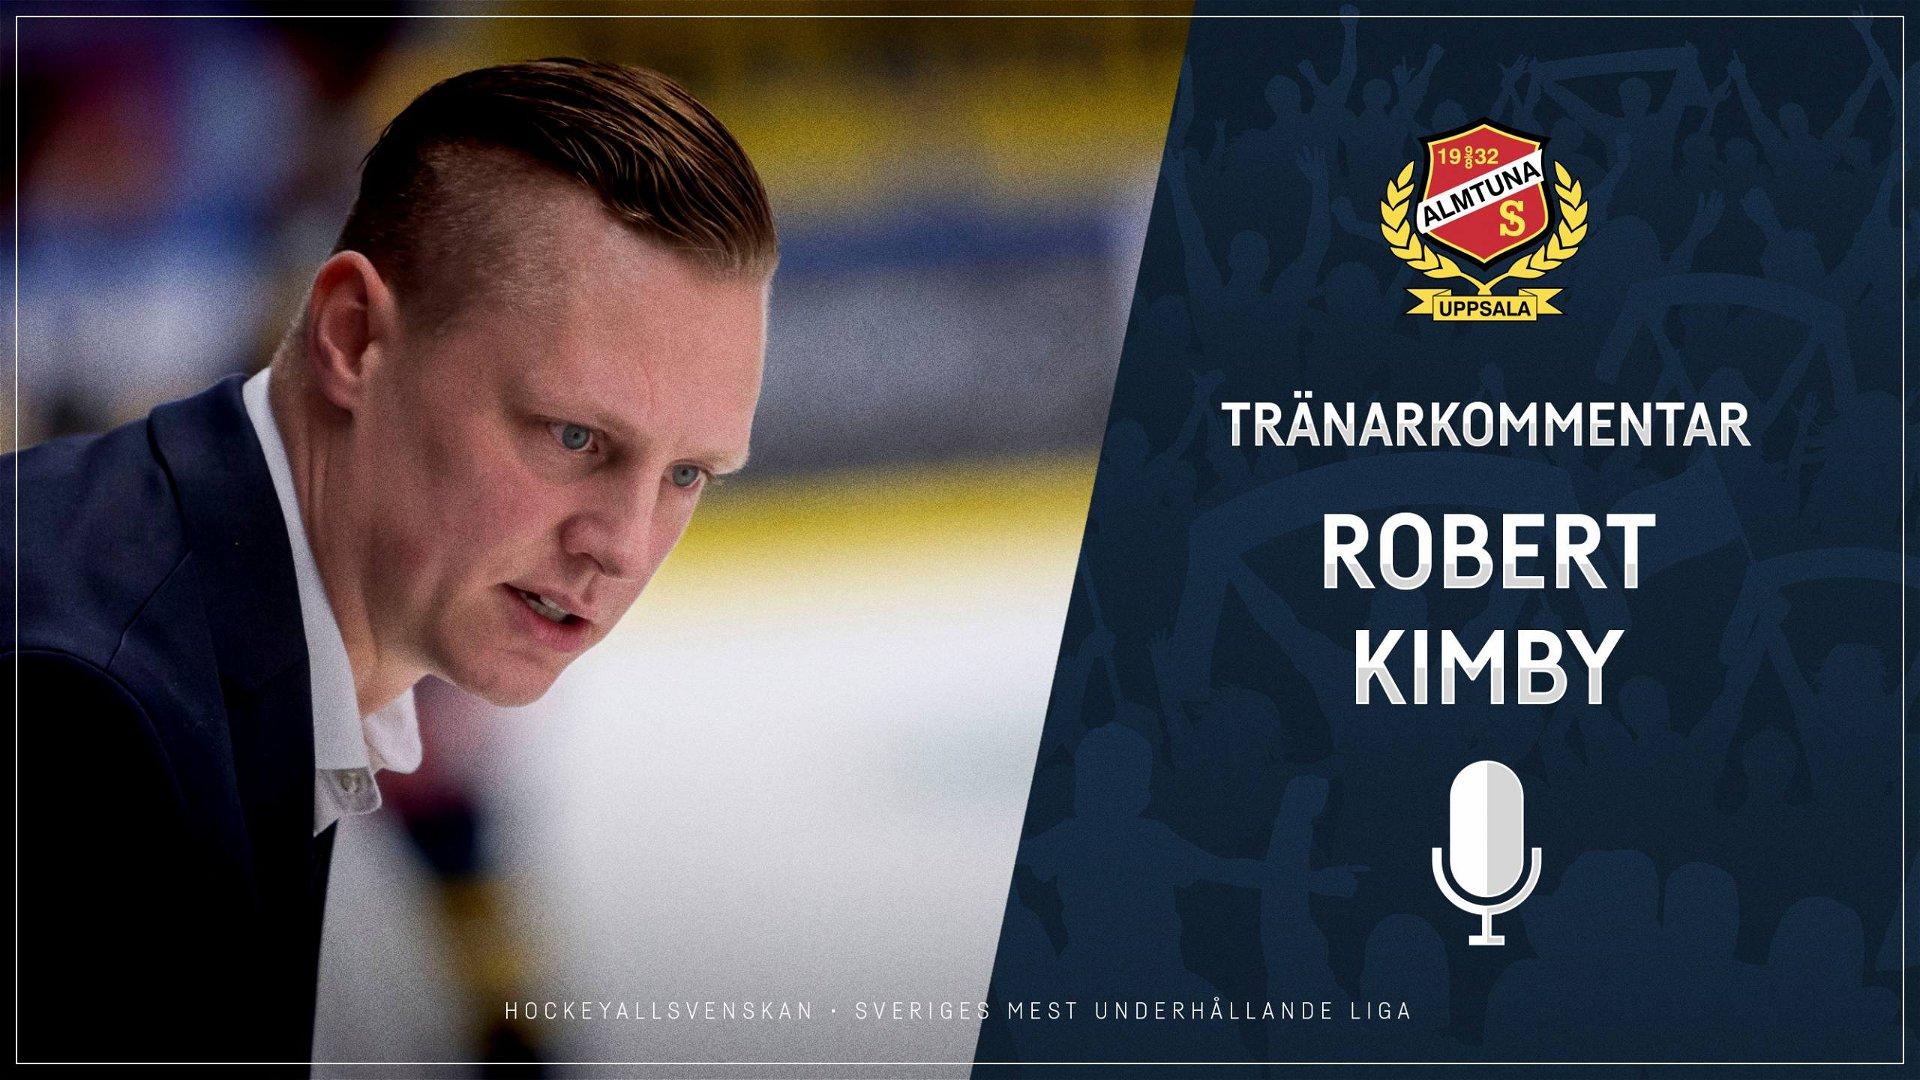 2021-02-27 Segerintervju: Robert Kimby